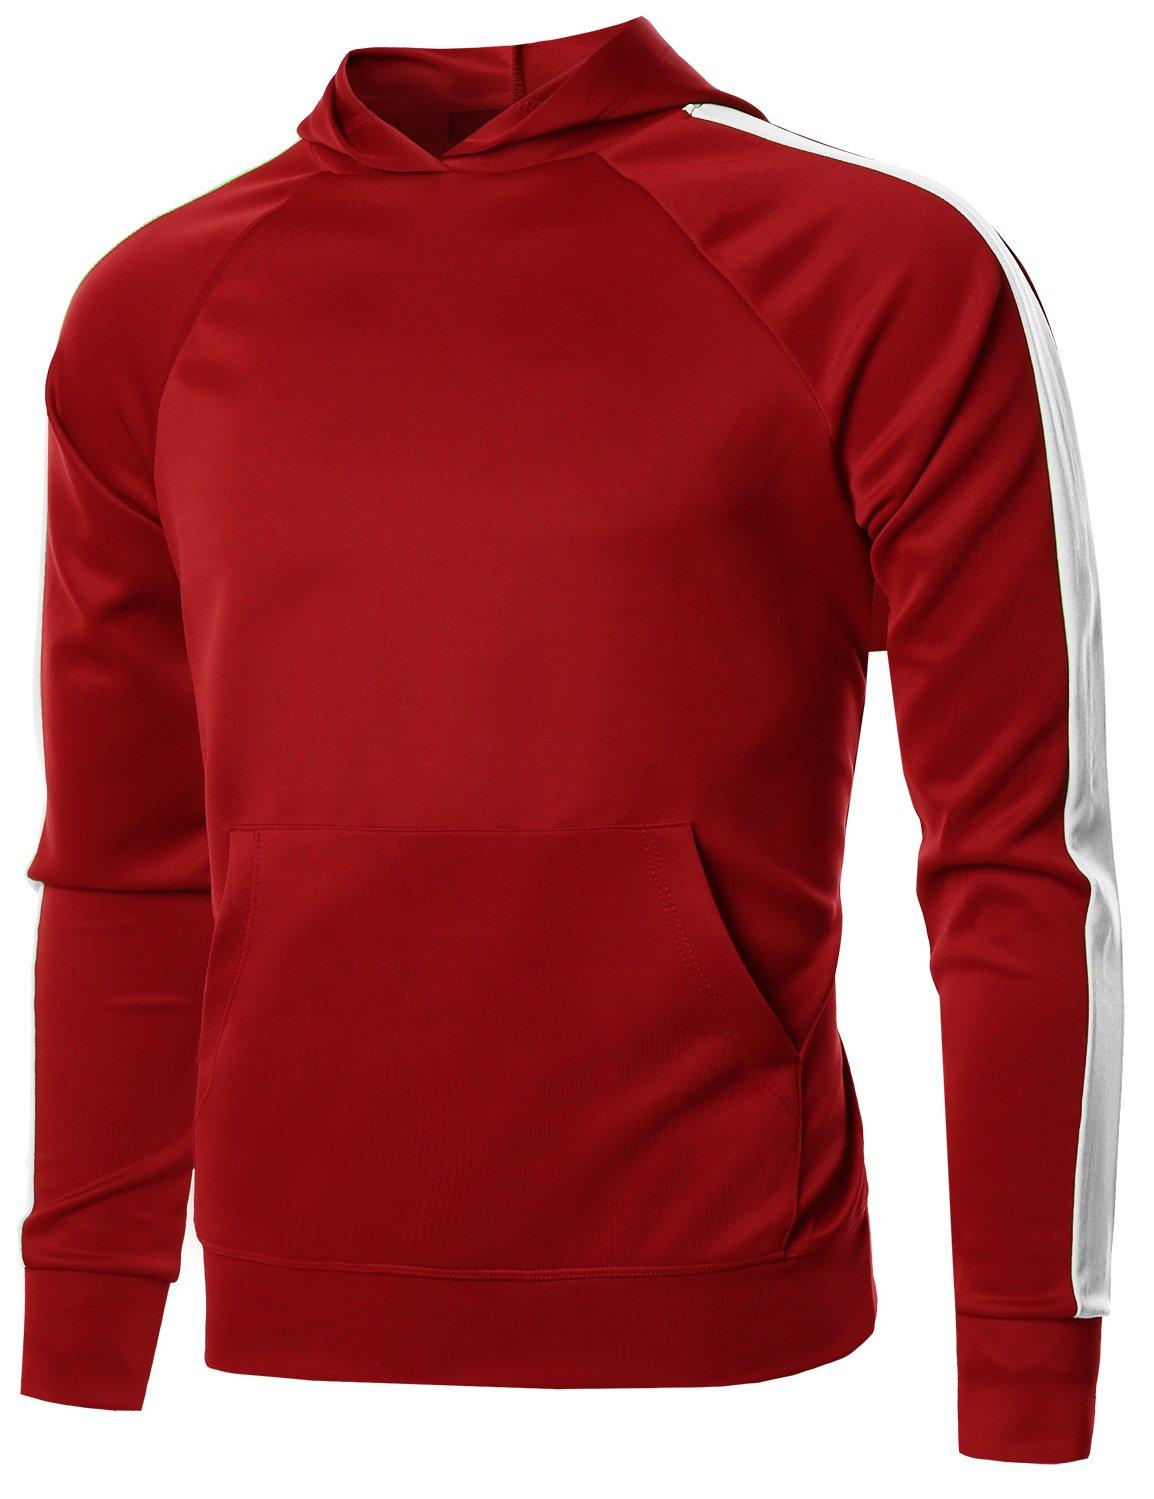 Style by William PANTS メンズ B07B8TC4P8 Medium|Fsmhdl0008 Red White Fsmhdl0008 Red White Medium